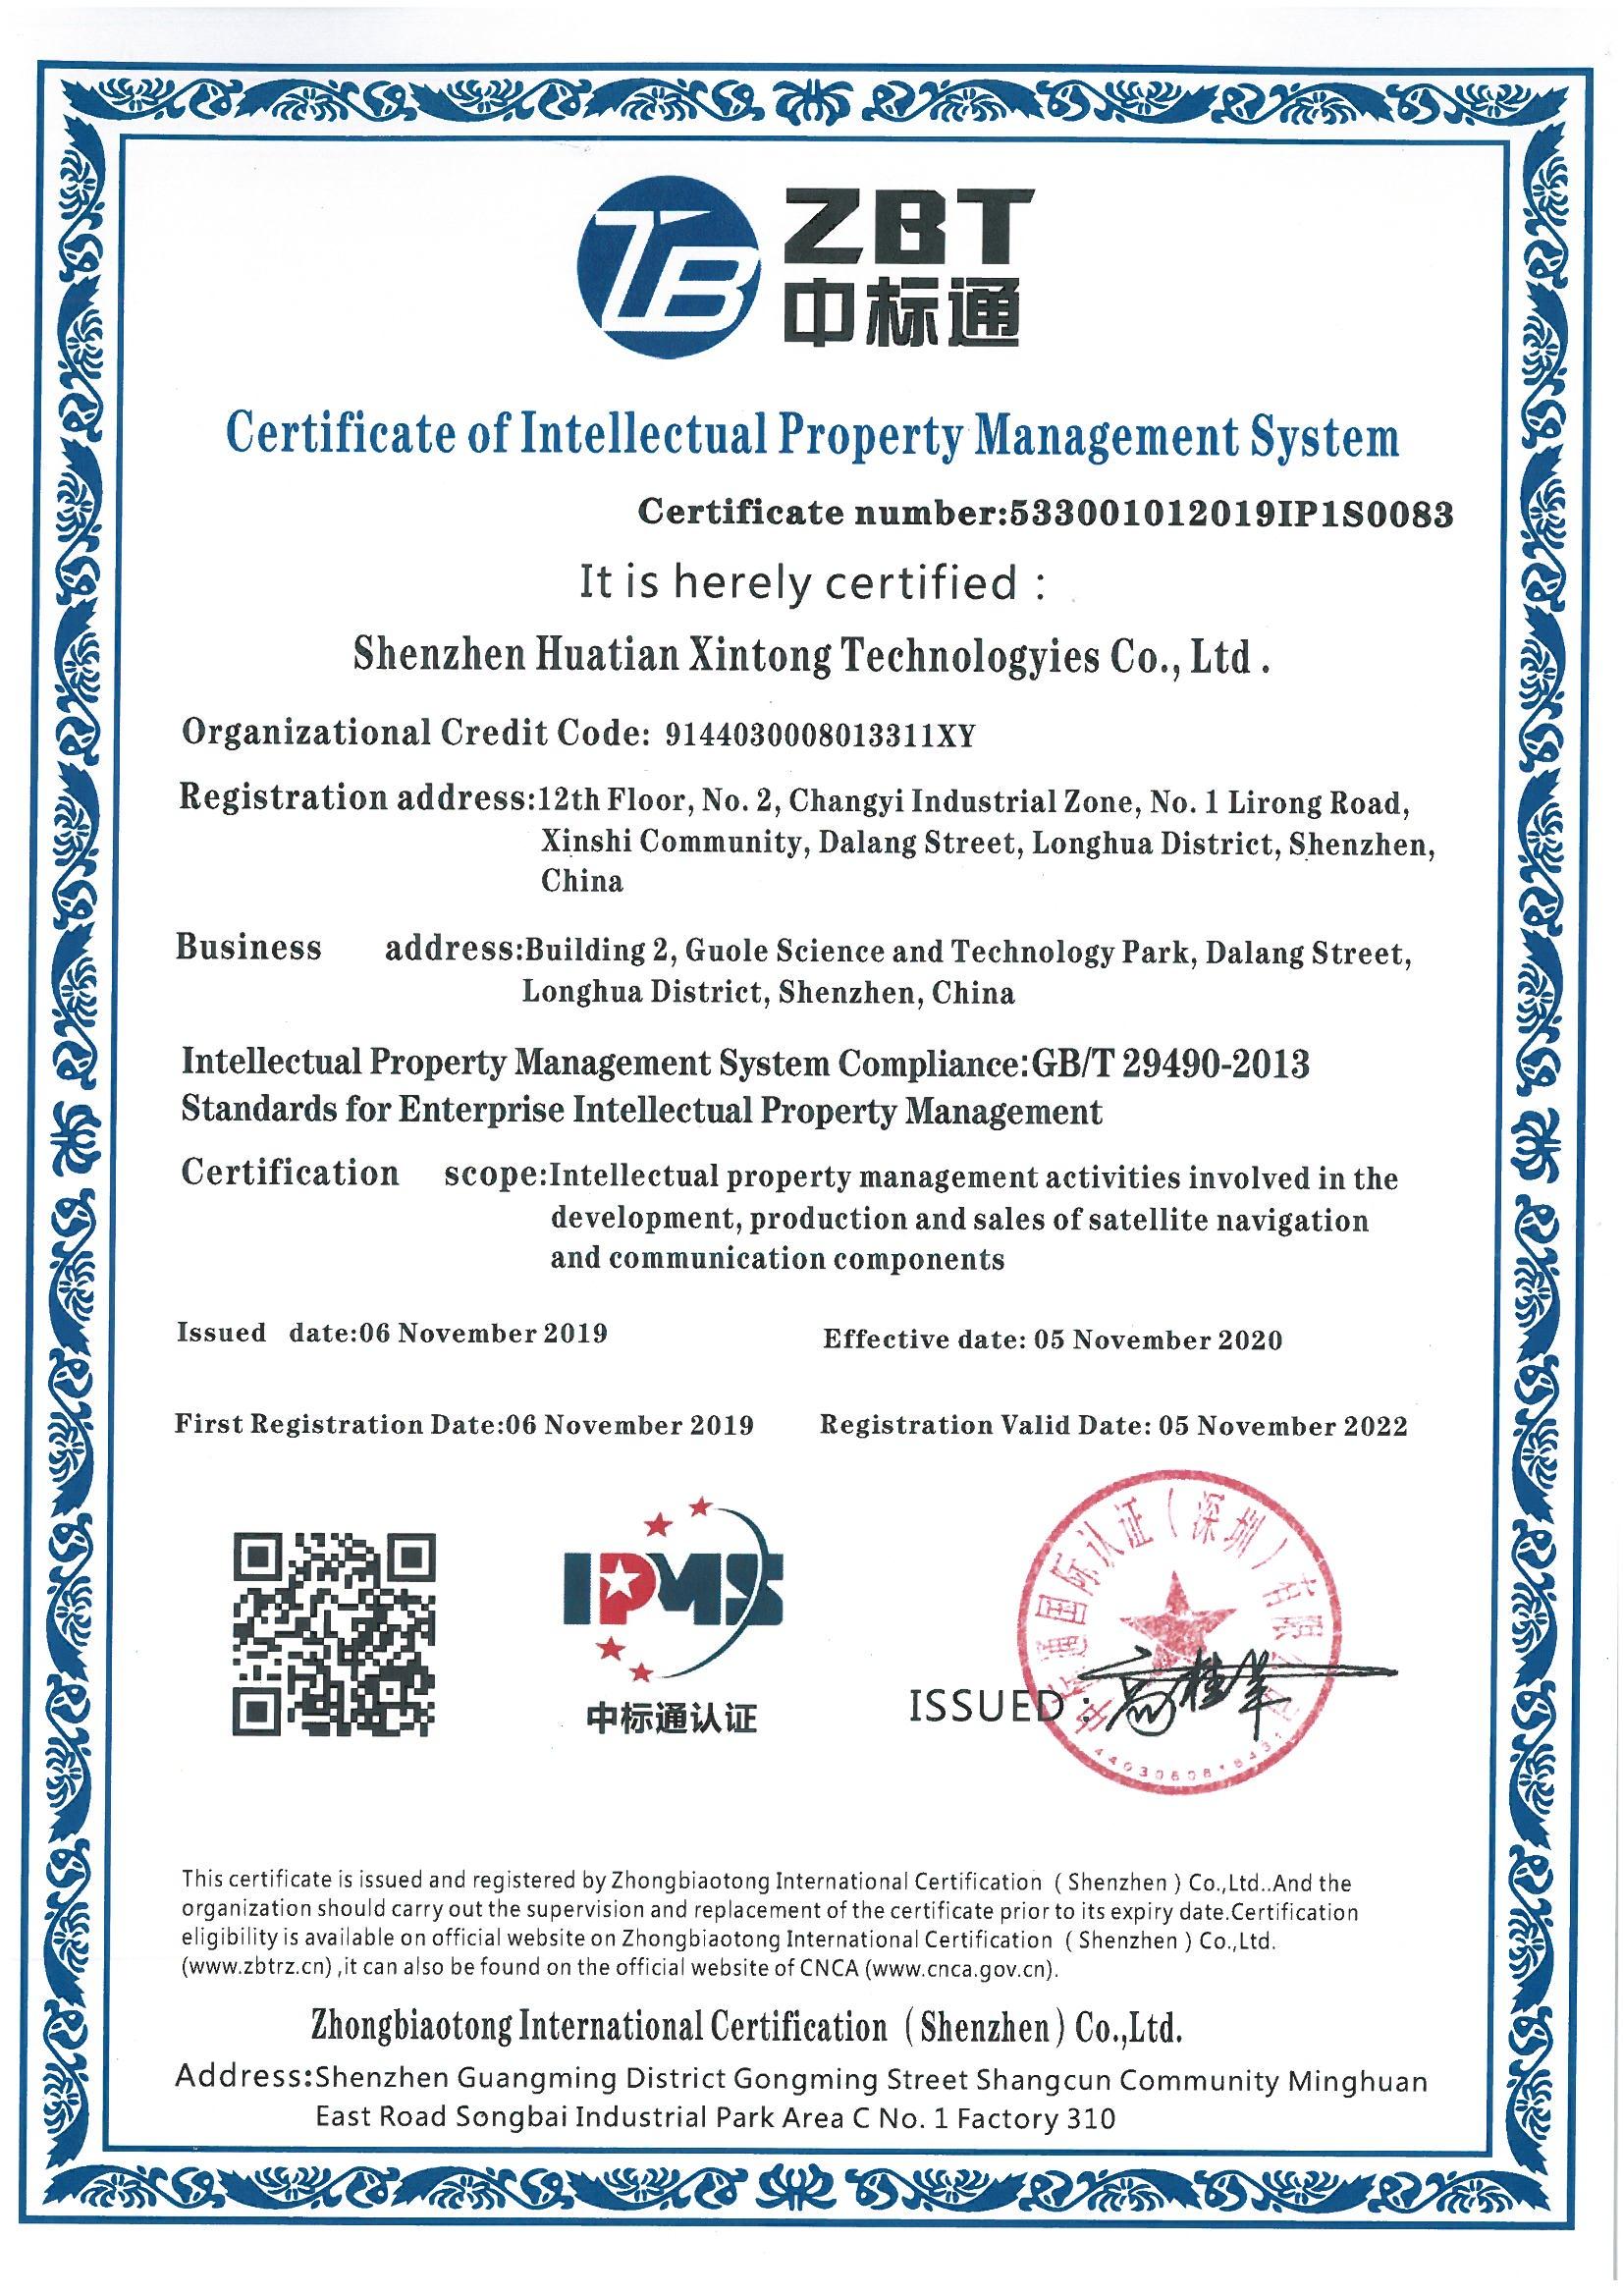 <span>知识产权管理认证体系证书</span>